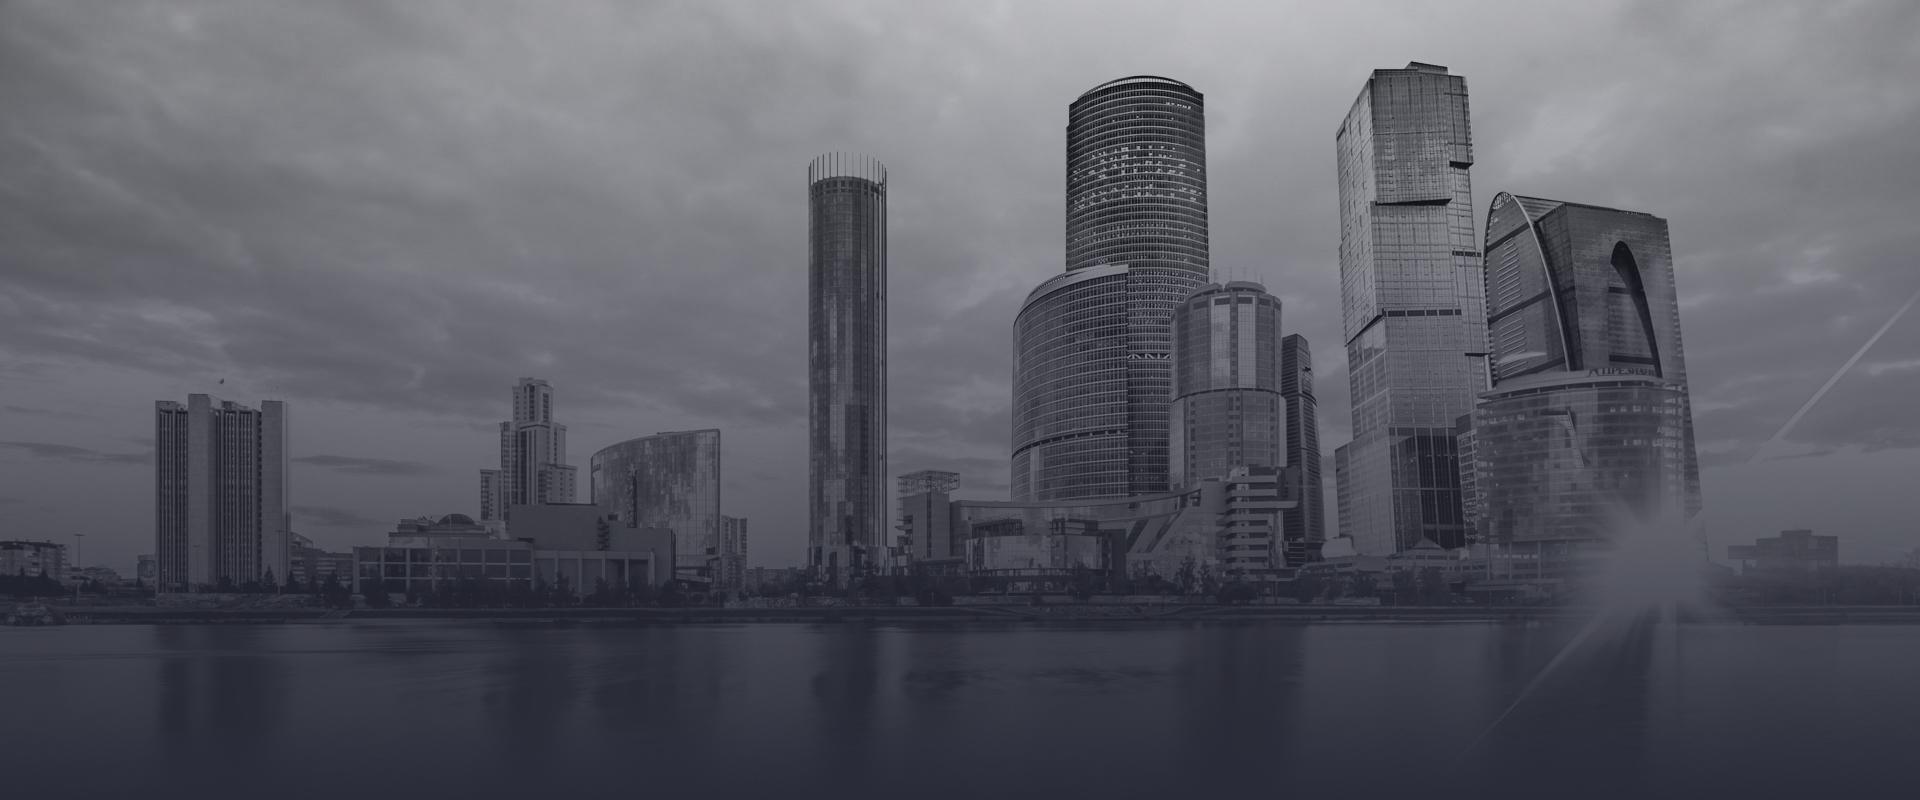 OtelEKB | Снять квартиру посуточно в Екатеринбурге